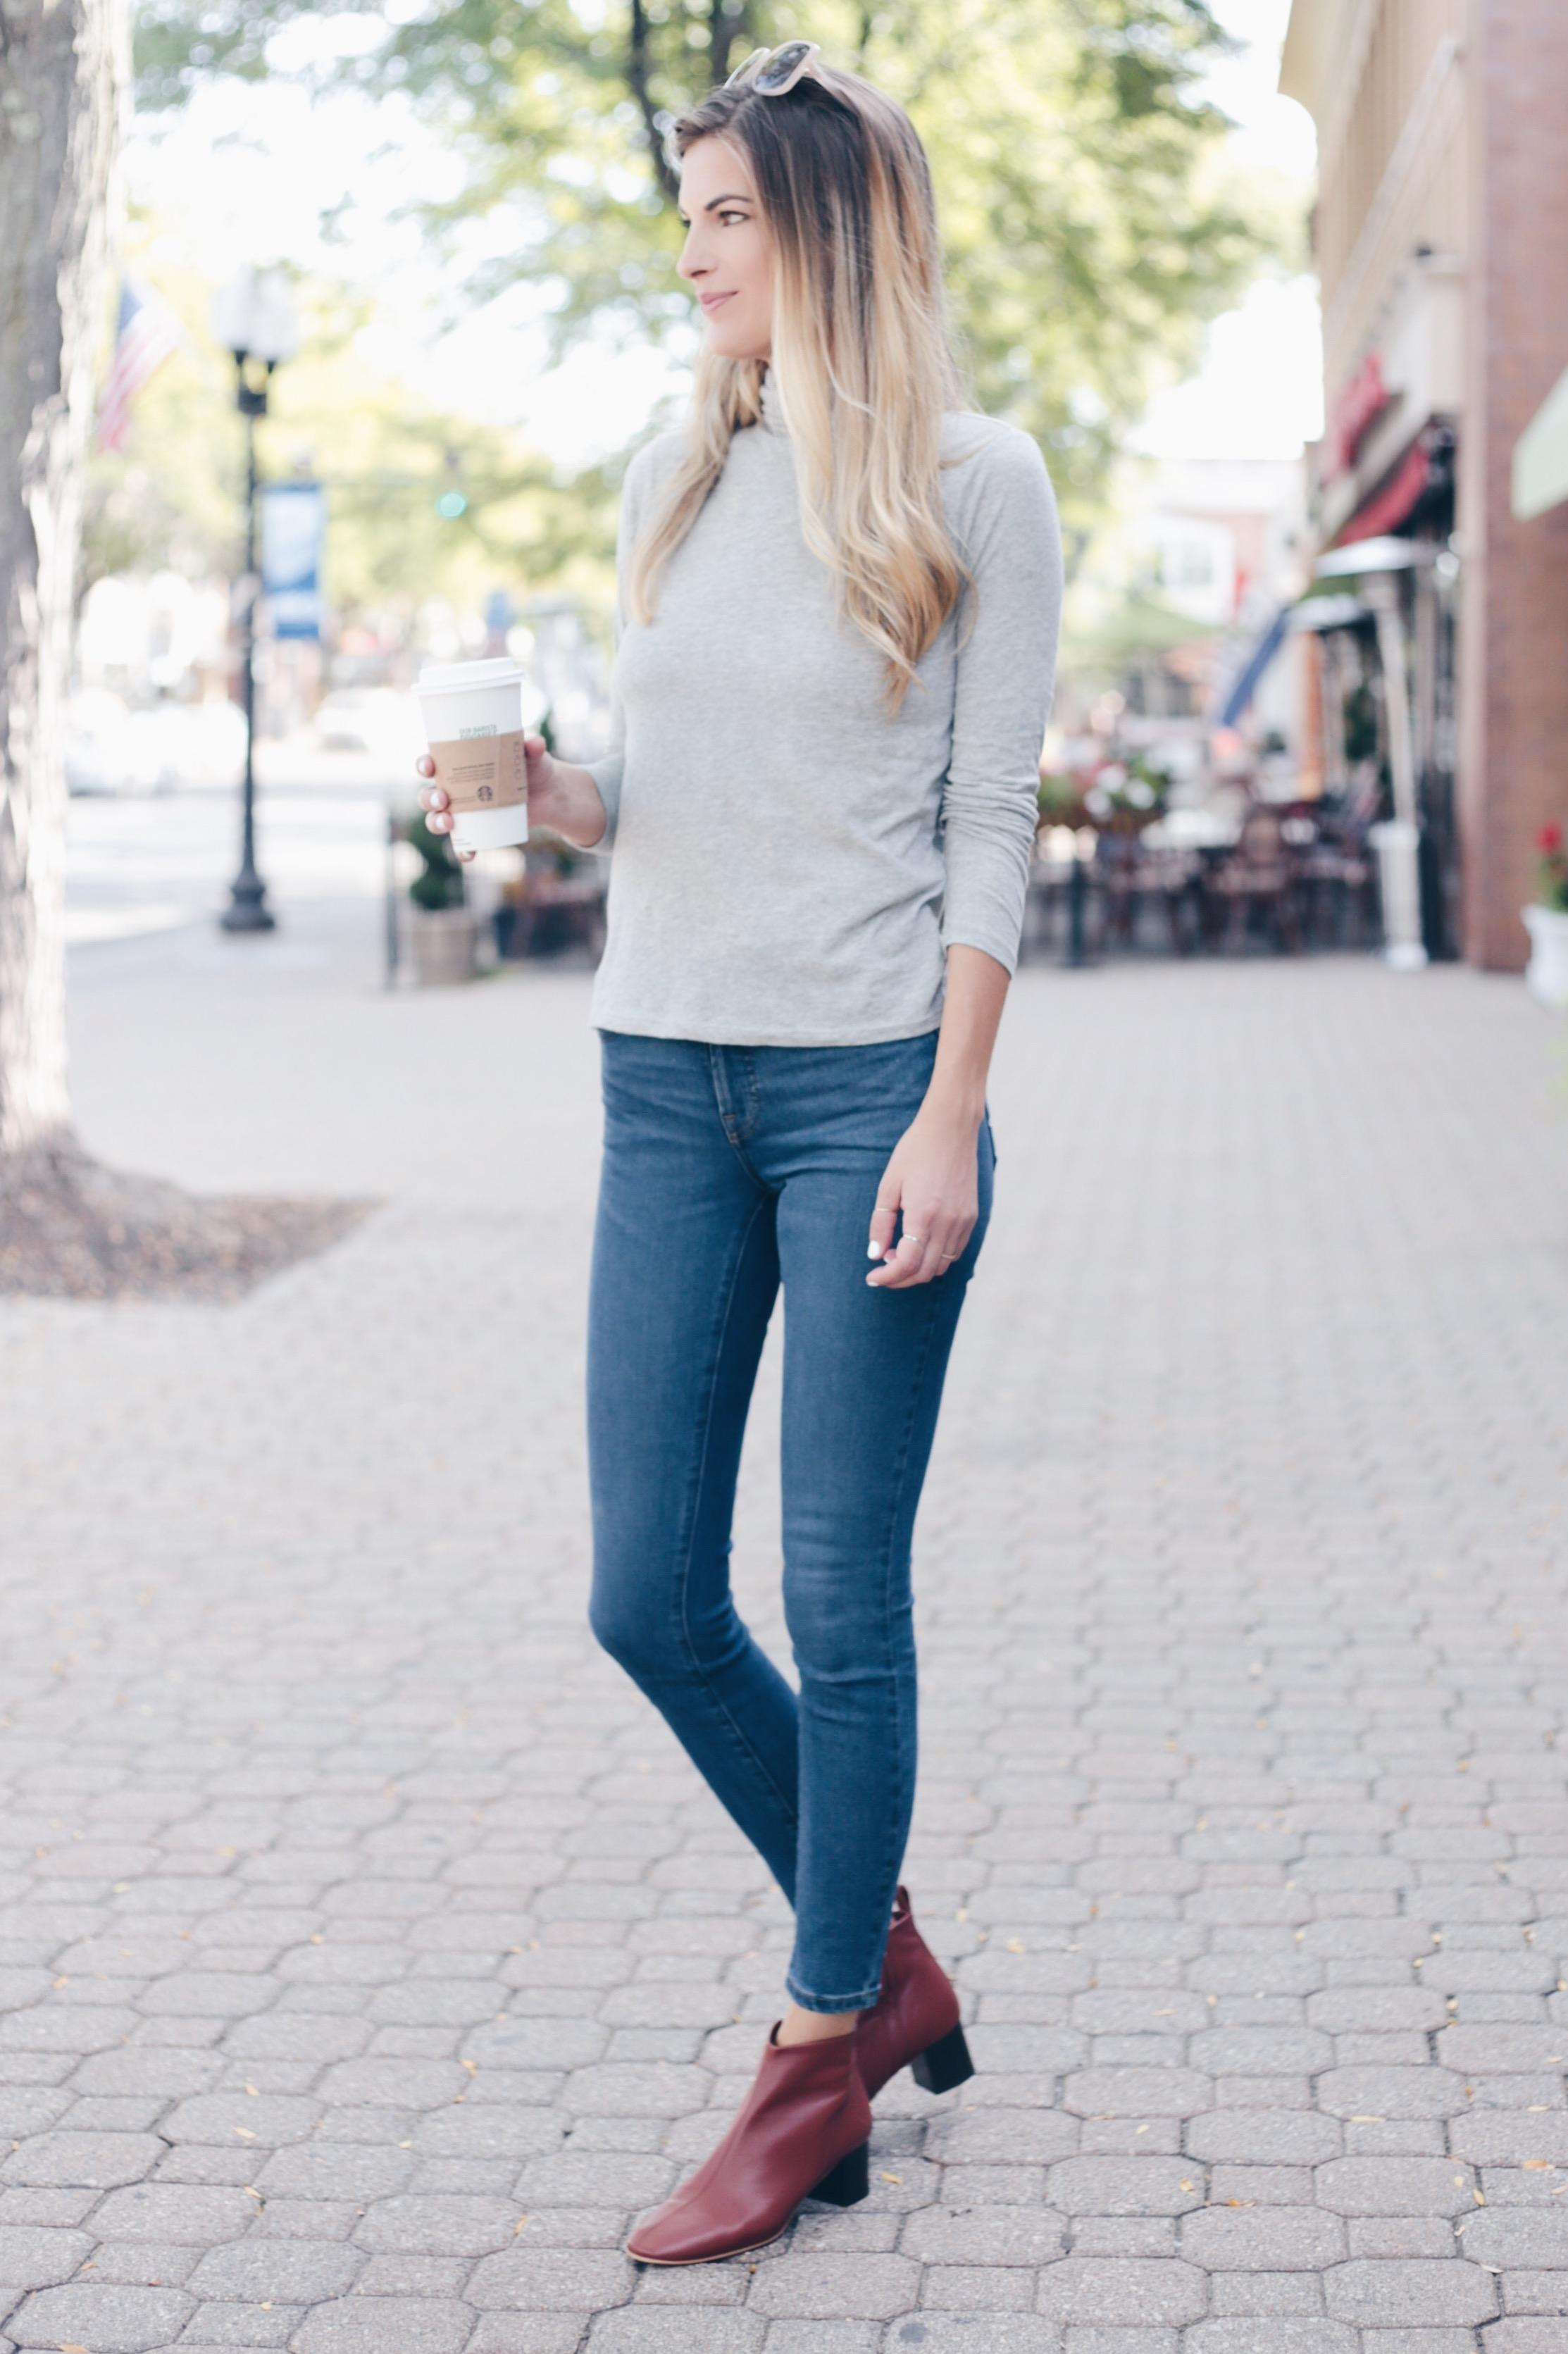 Comfortable Jeans | Modern Basics for Fall